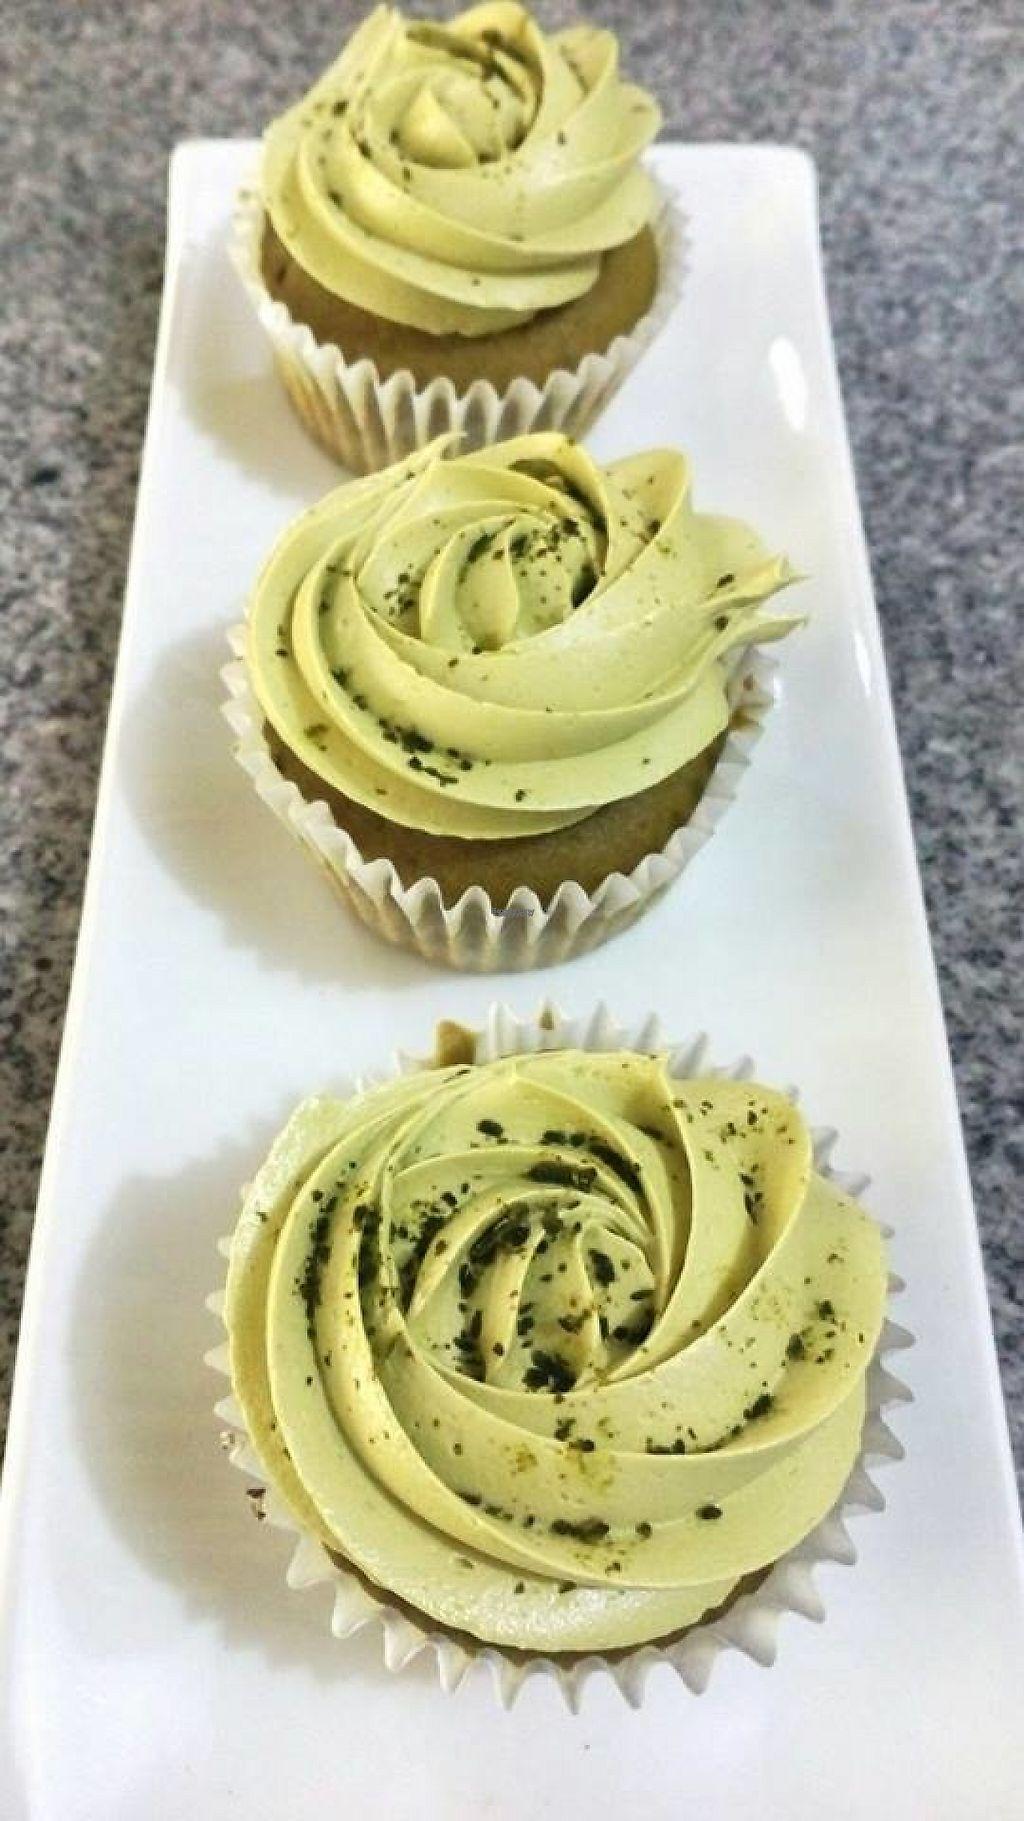 "Photo of Dessert First  by <a href=""/members/profile/supertofu"">supertofu</a> <br/>vegan matcha greentea cupcakes <br/> January 8, 2017  - <a href='/contact/abuse/image/85102/209390'>Report</a>"